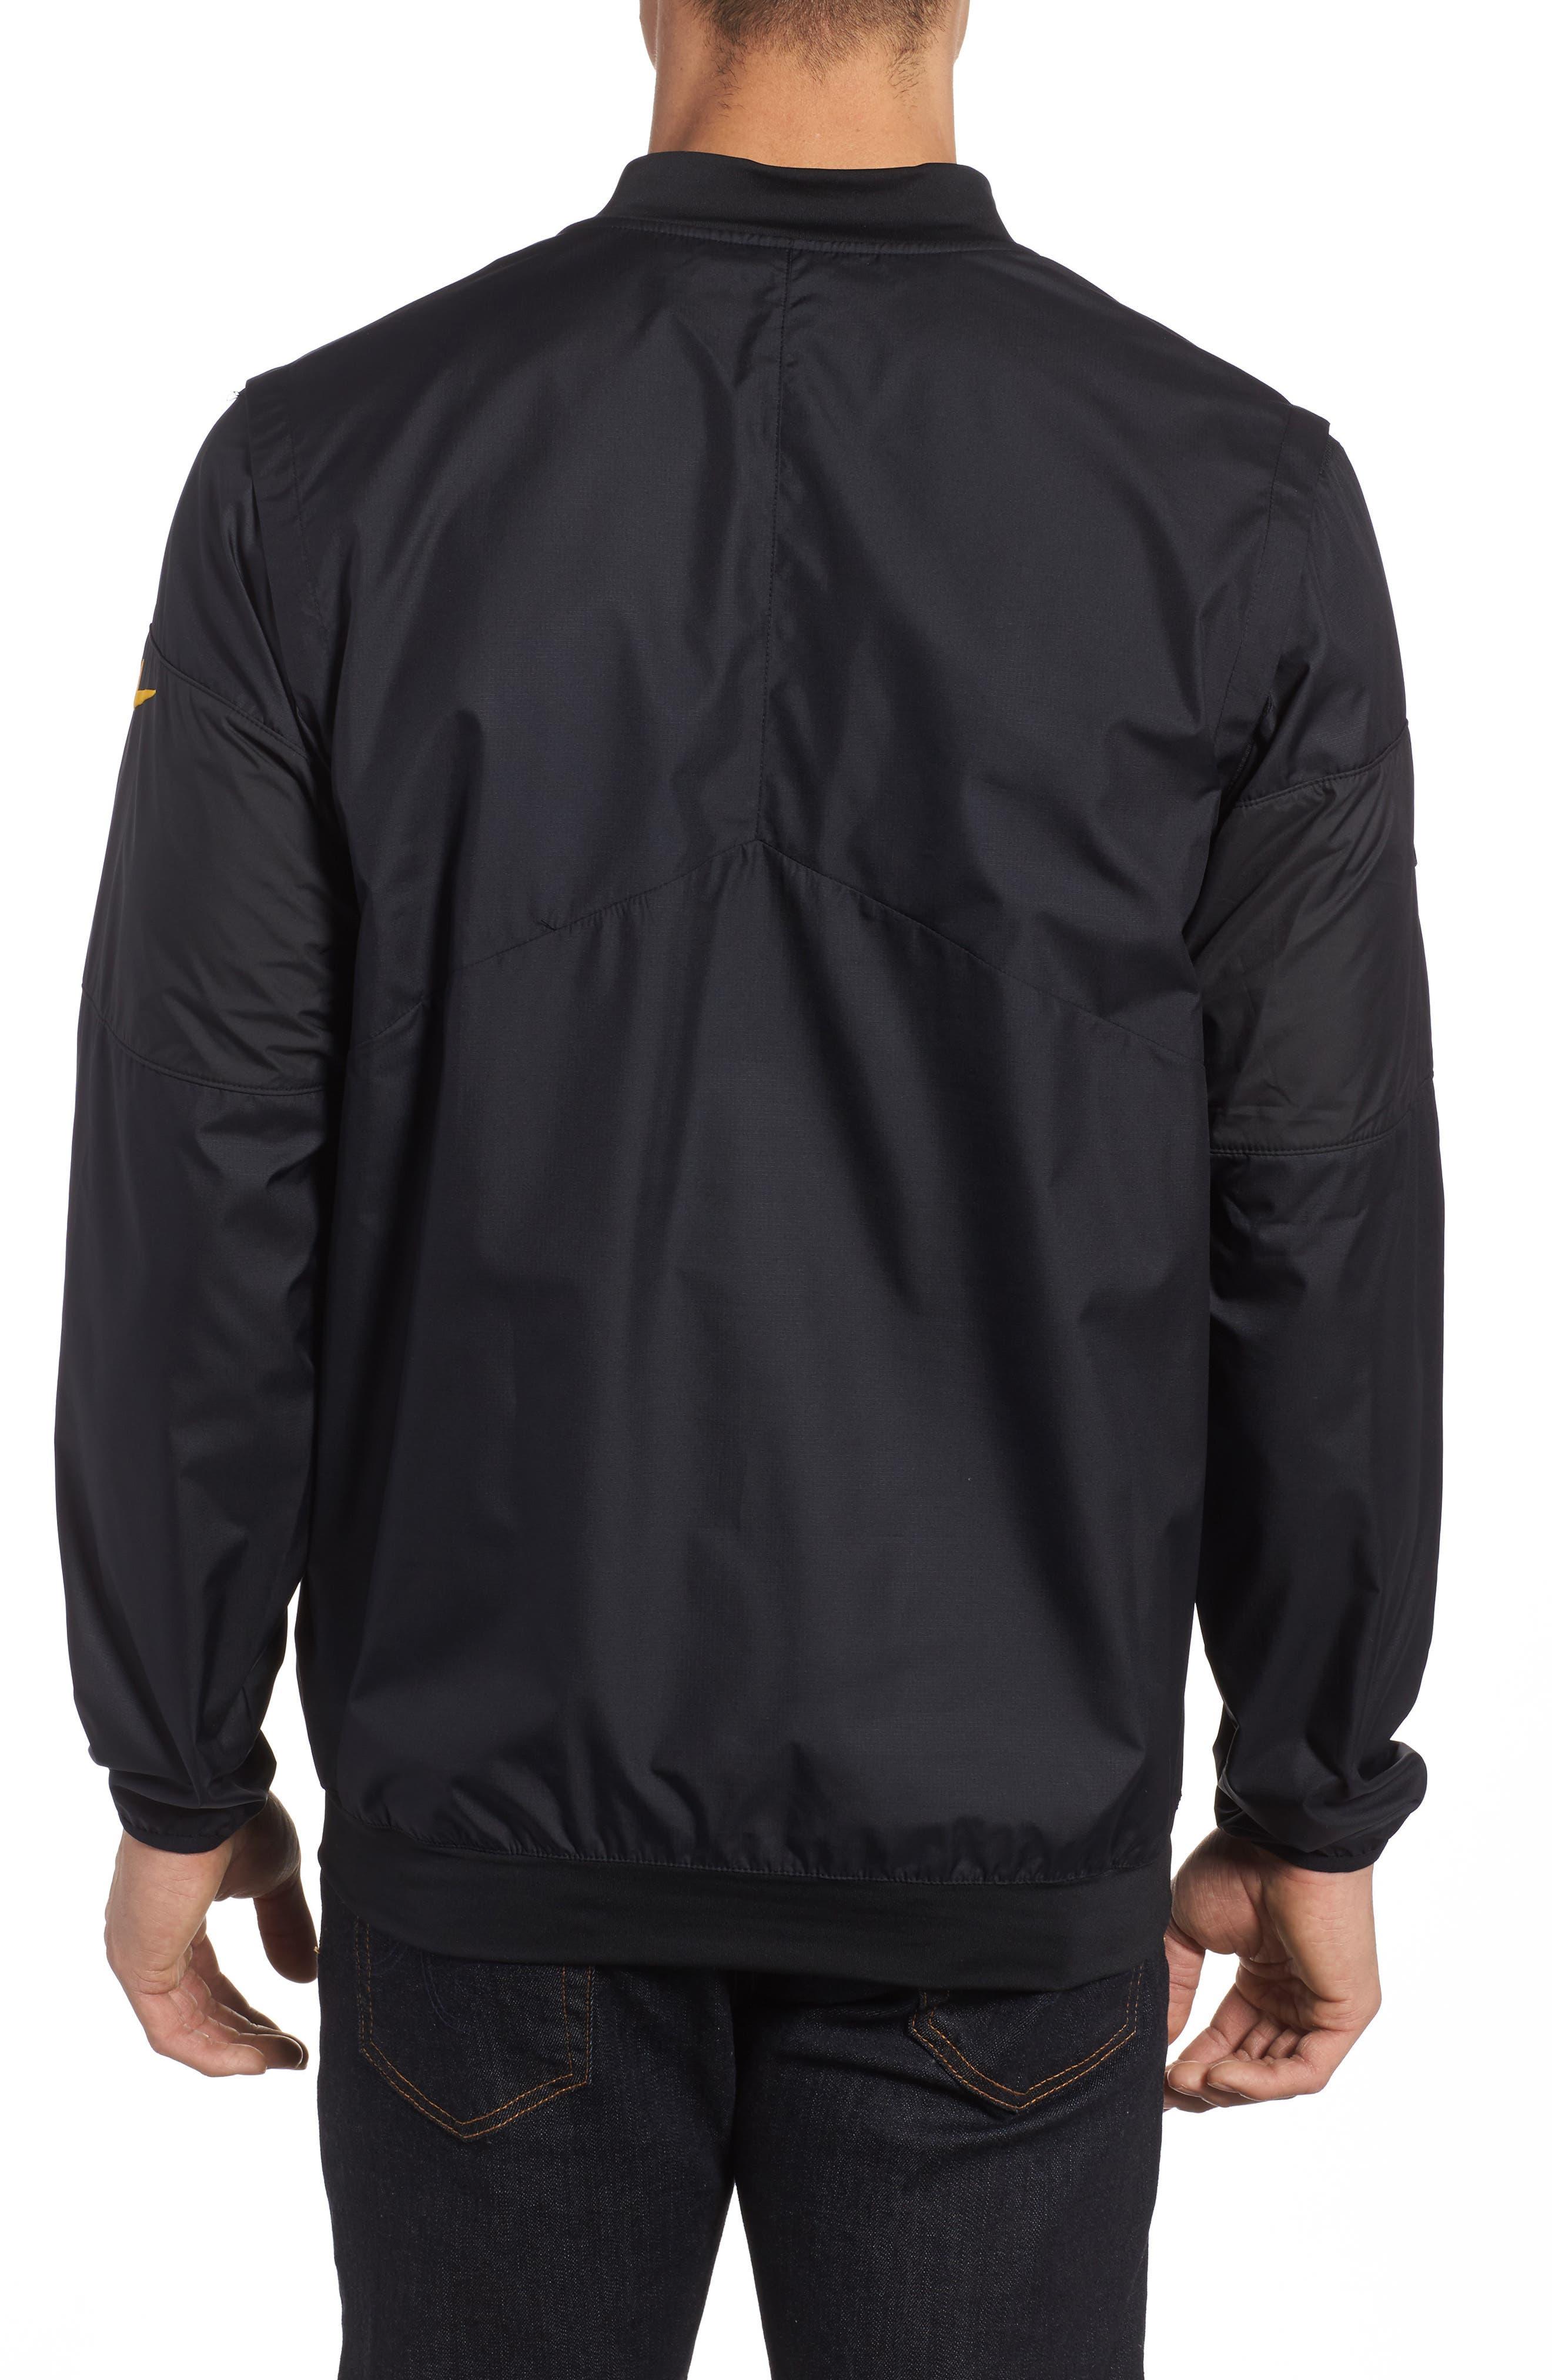 Lockdown NFL Pullover Jacket,                             Alternate thumbnail 7, color,